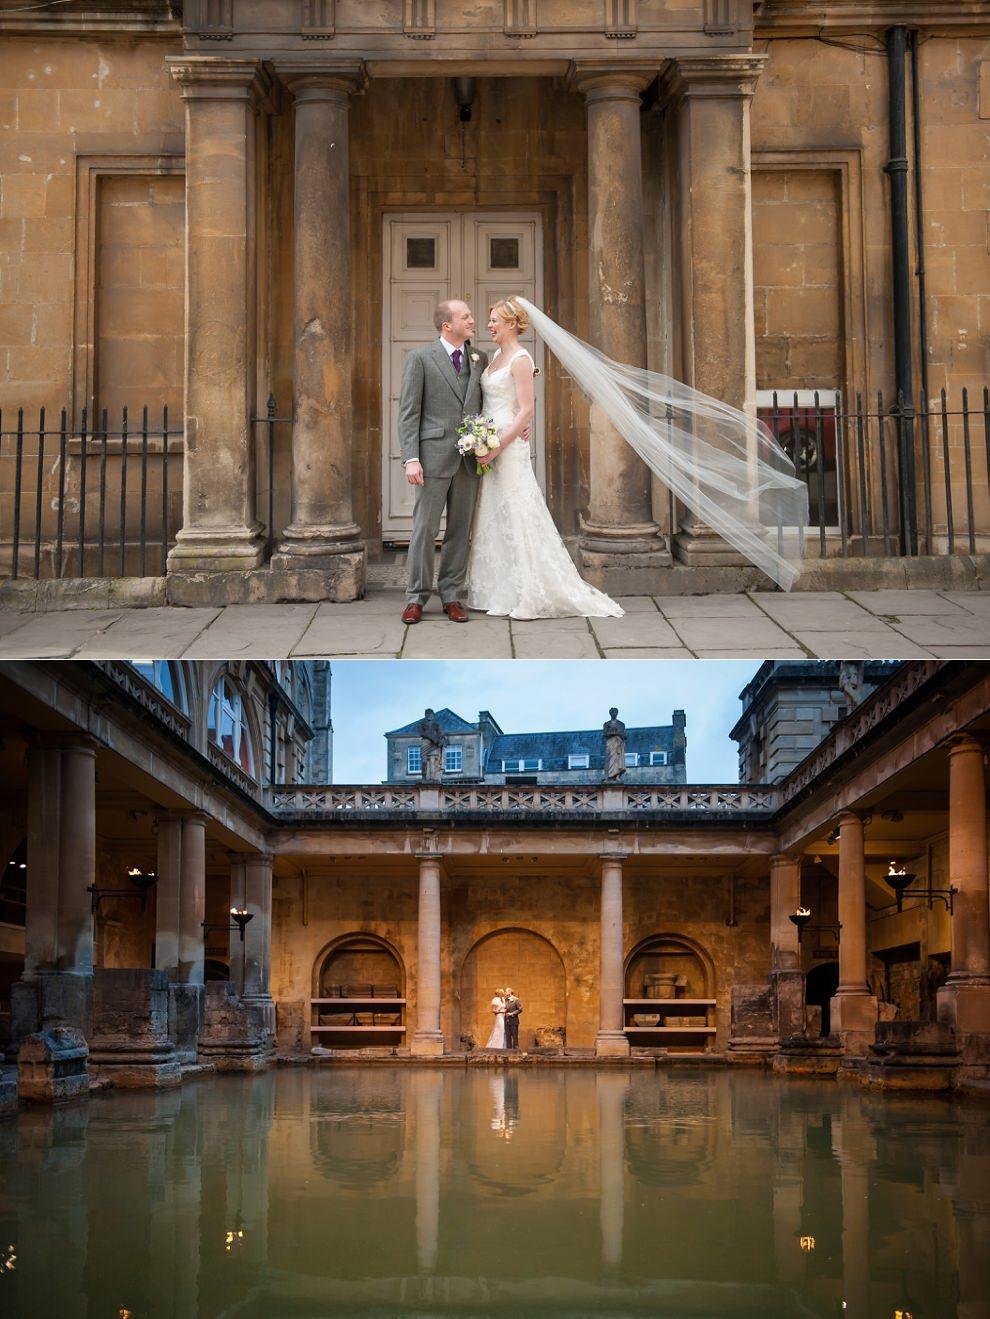 Best-wedding-photos-UK-2015-113